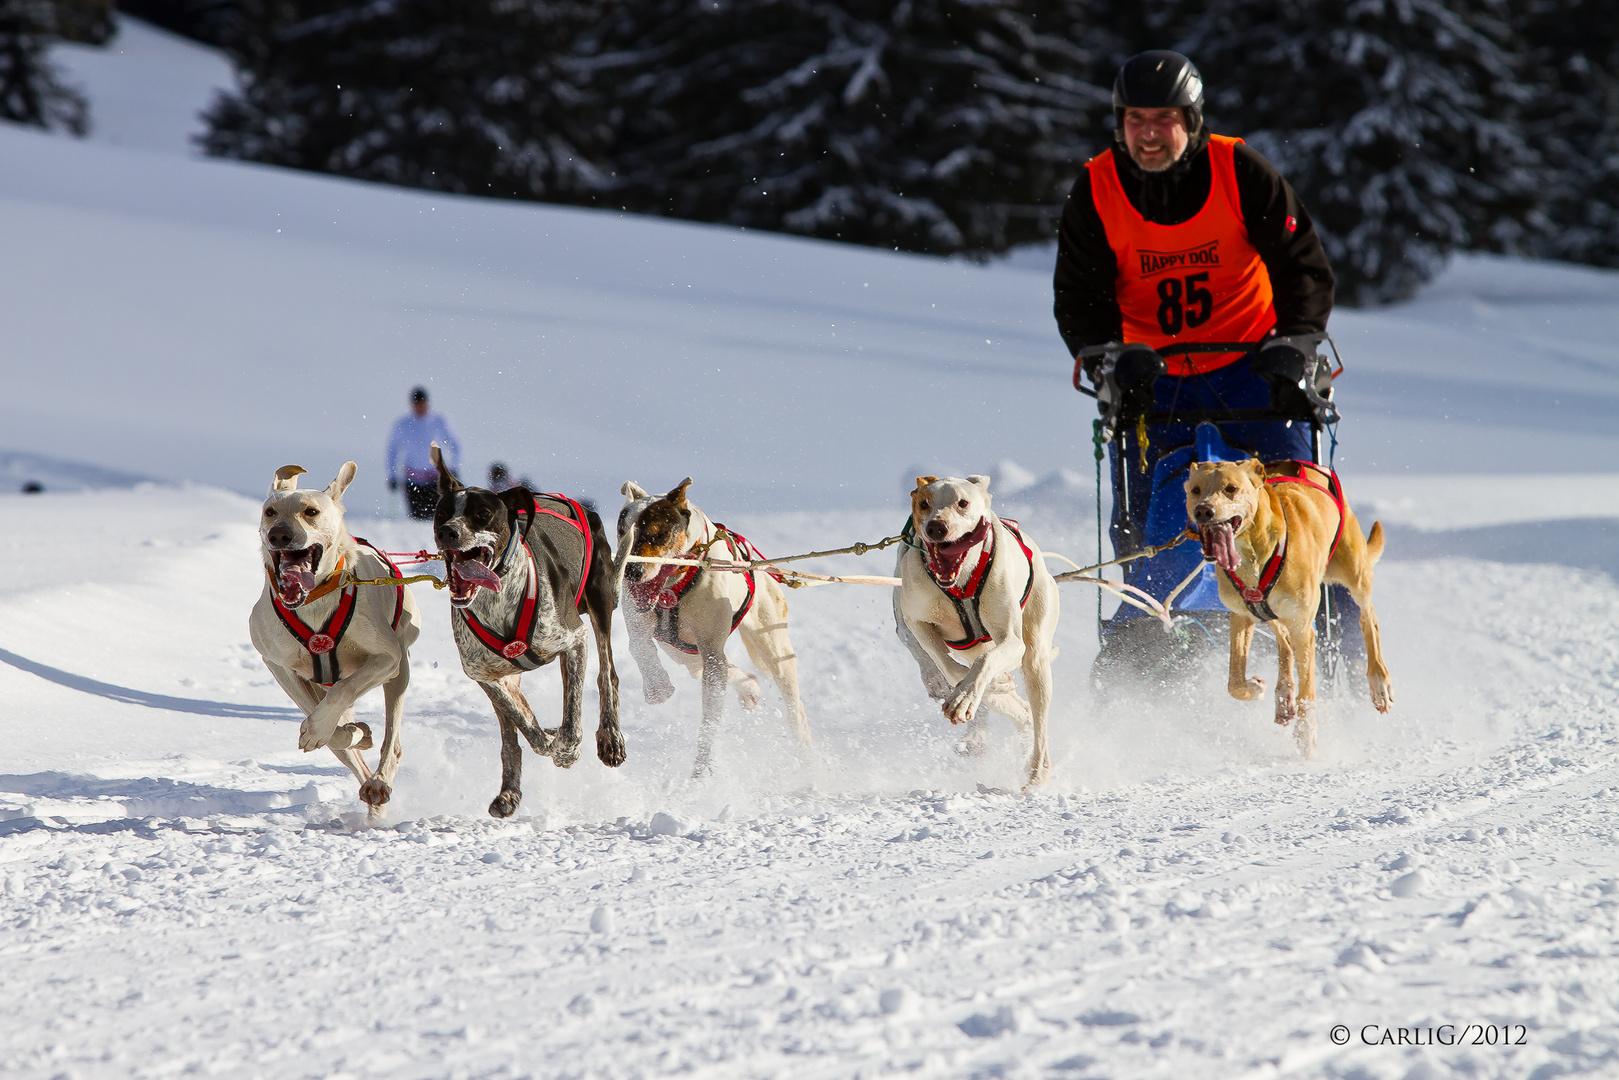 Hundschlittenrennen 2012 Bad Hindelang / Unterjoch